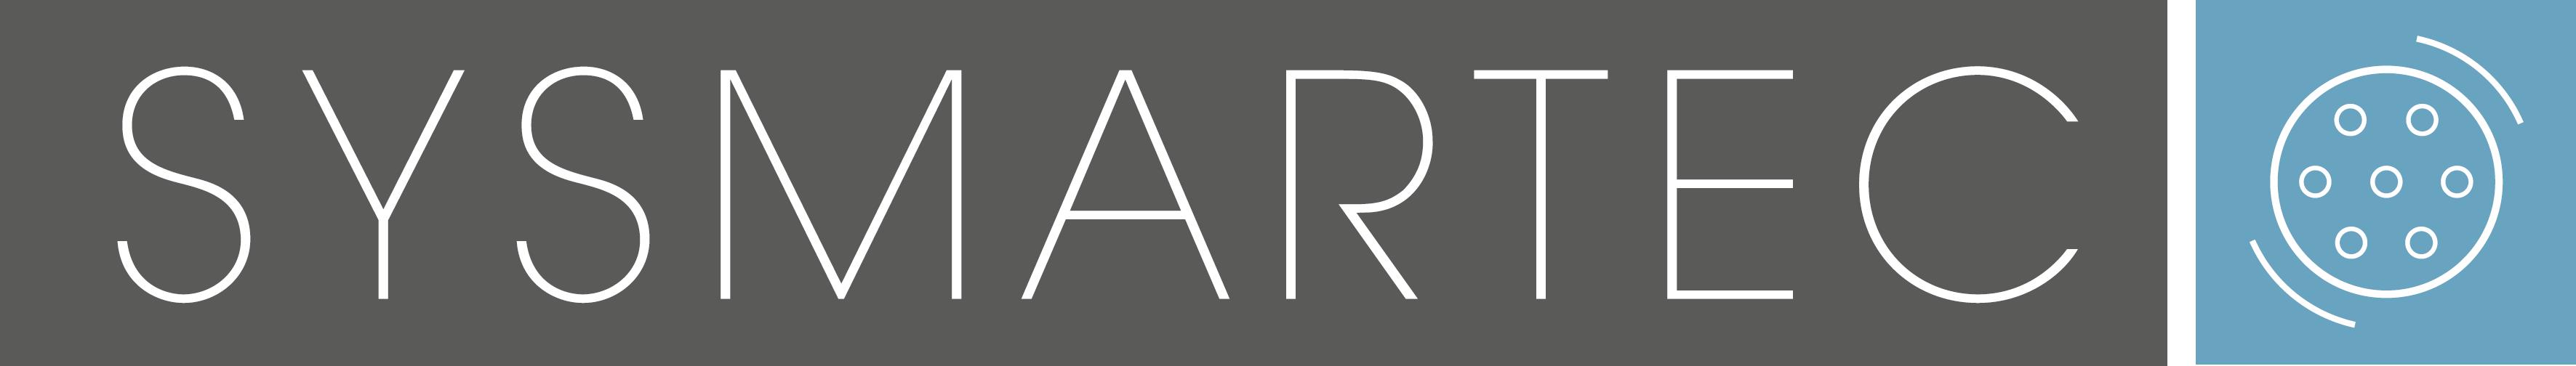 Logo SYSMARTEC GmbH